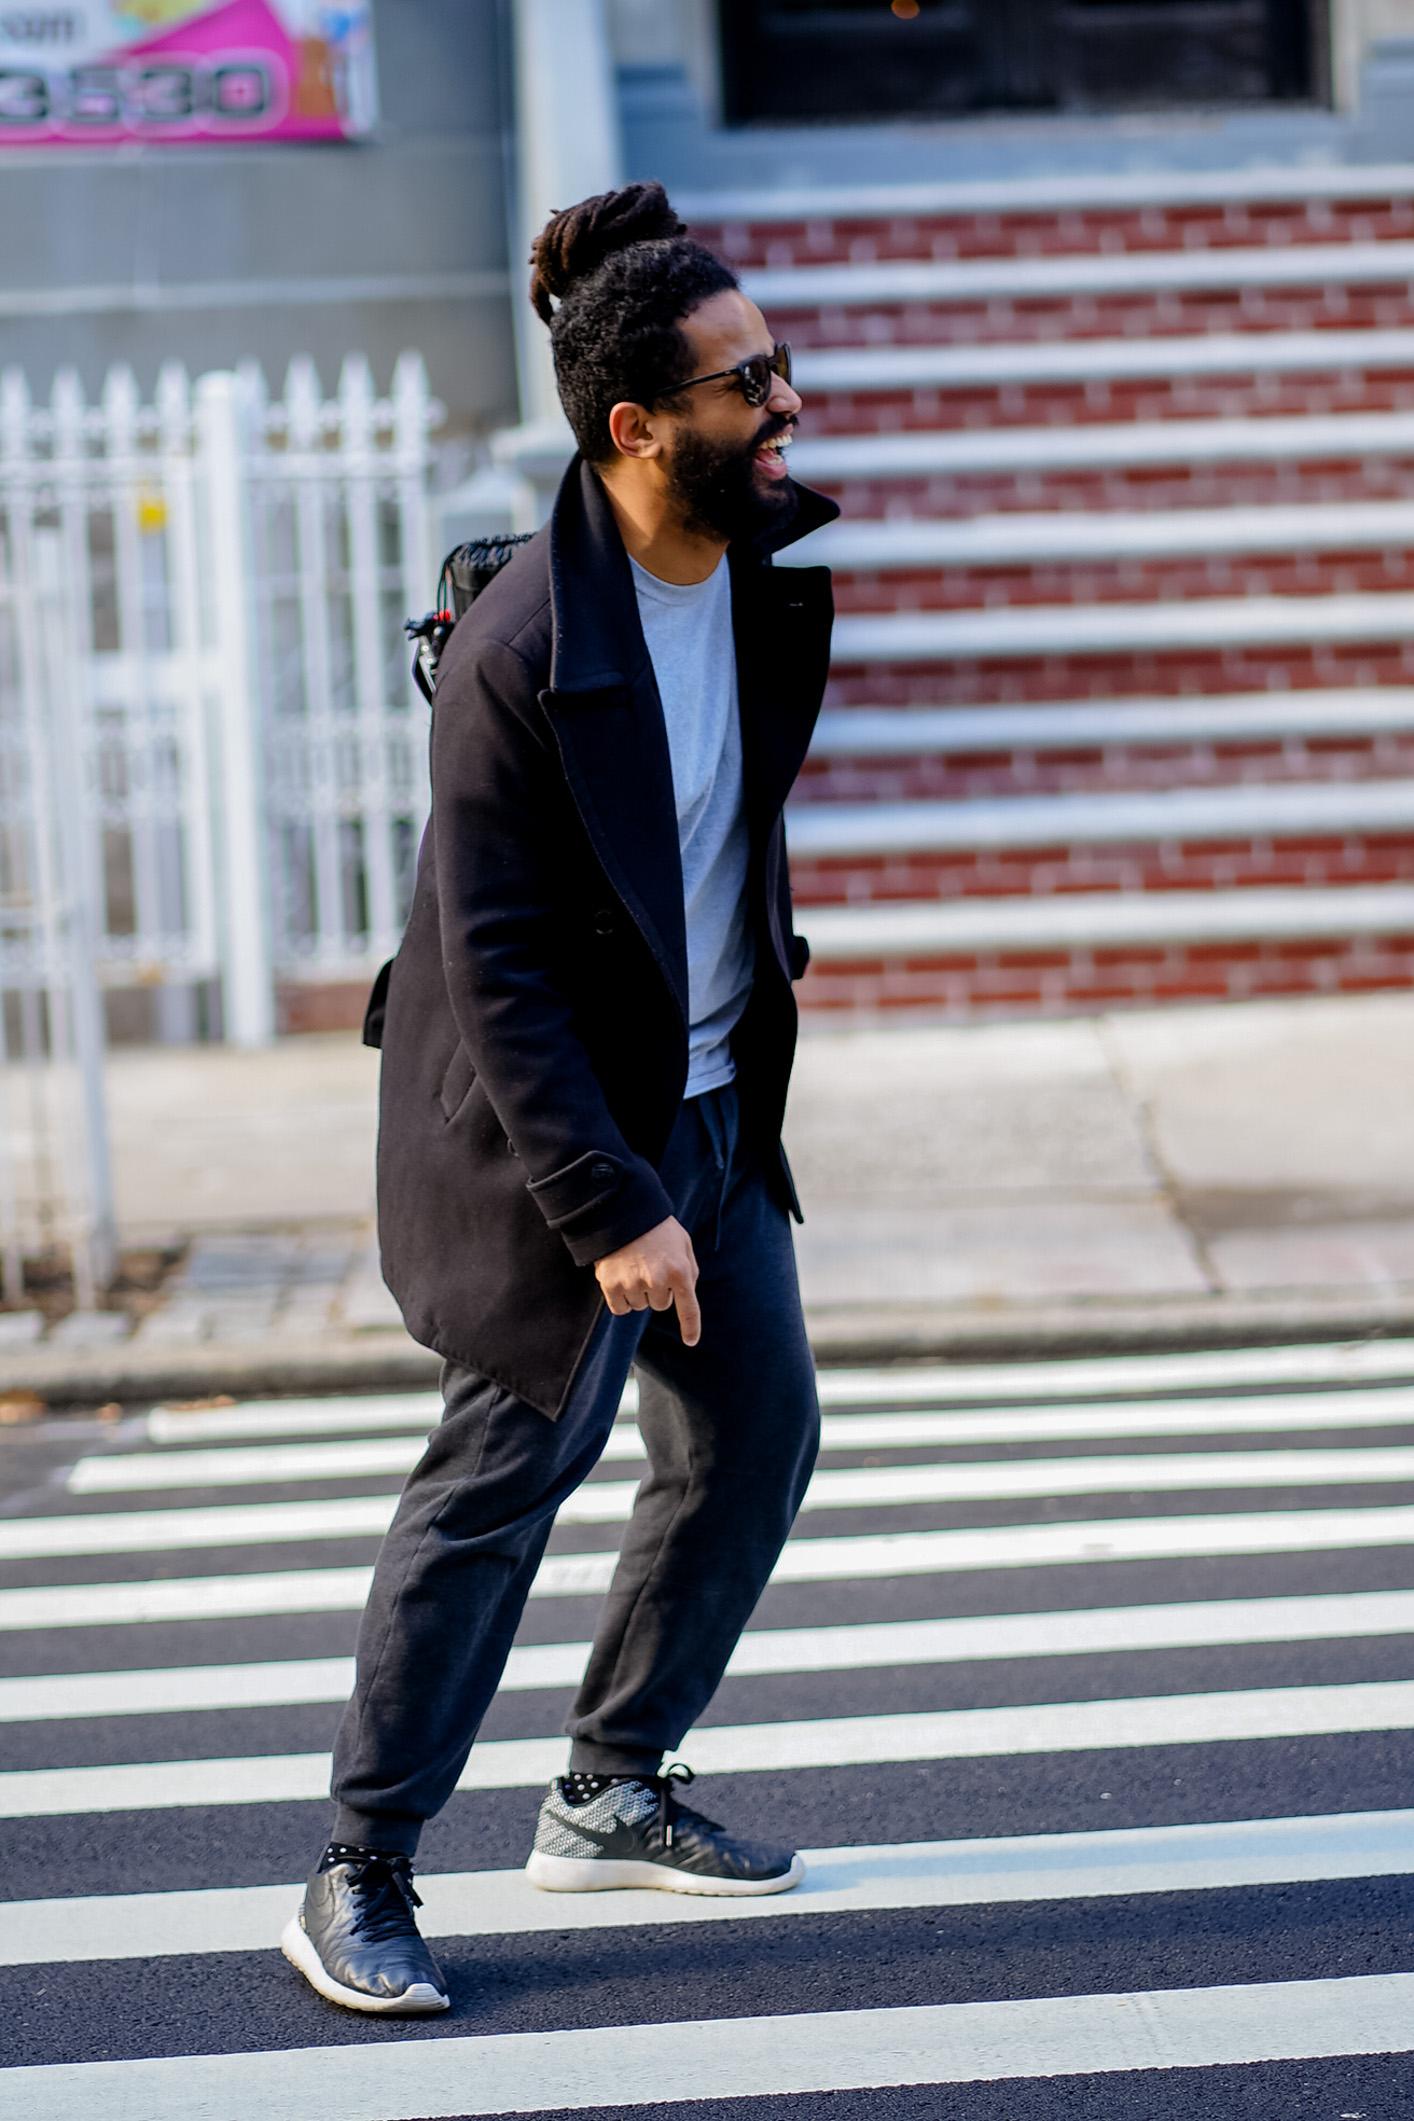 Baéz in Washington Heights, NYC, 2019. Portrait by Magdiel Báez.